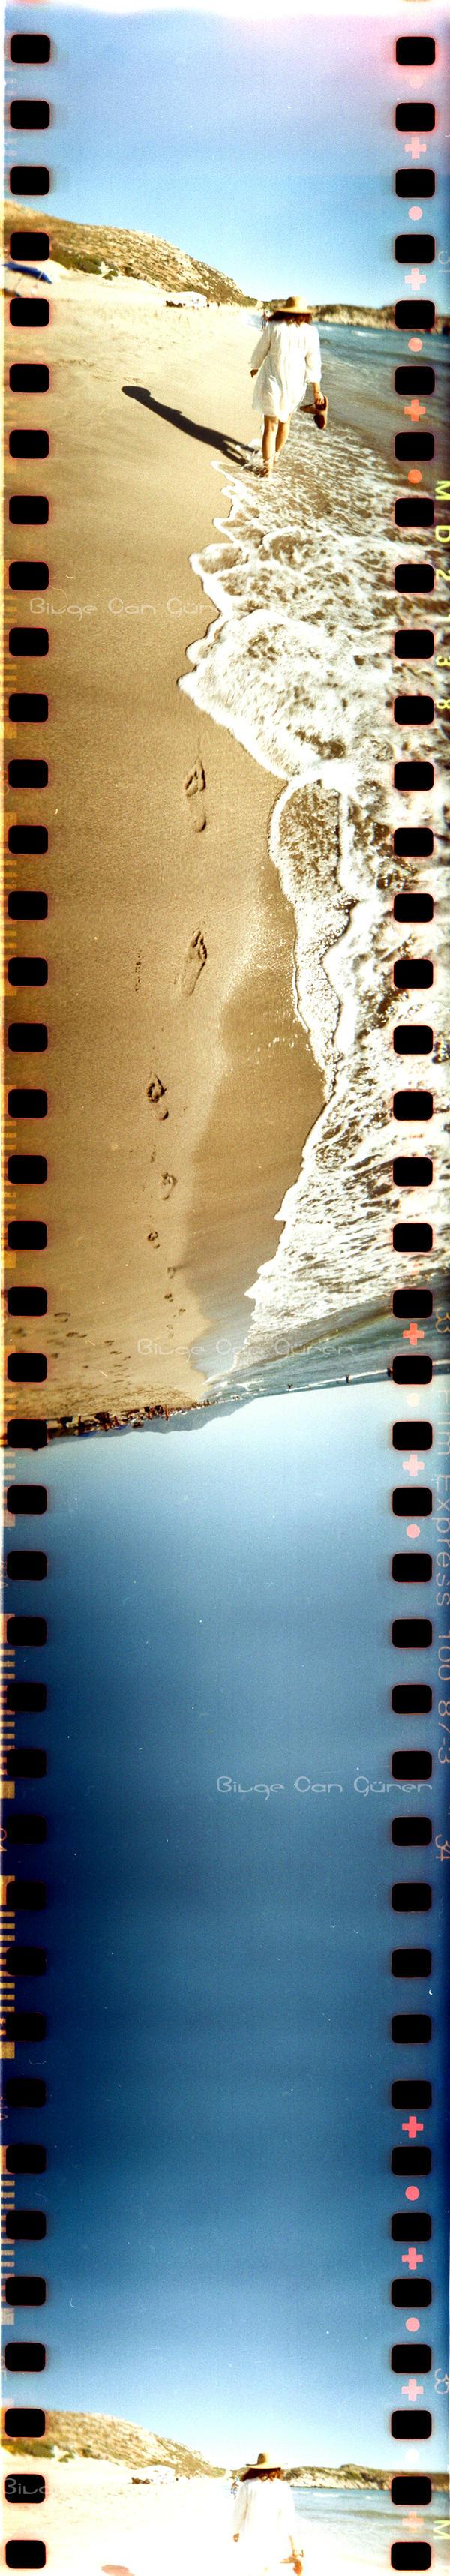 lettheseawashawayyourfootprints by Dredged